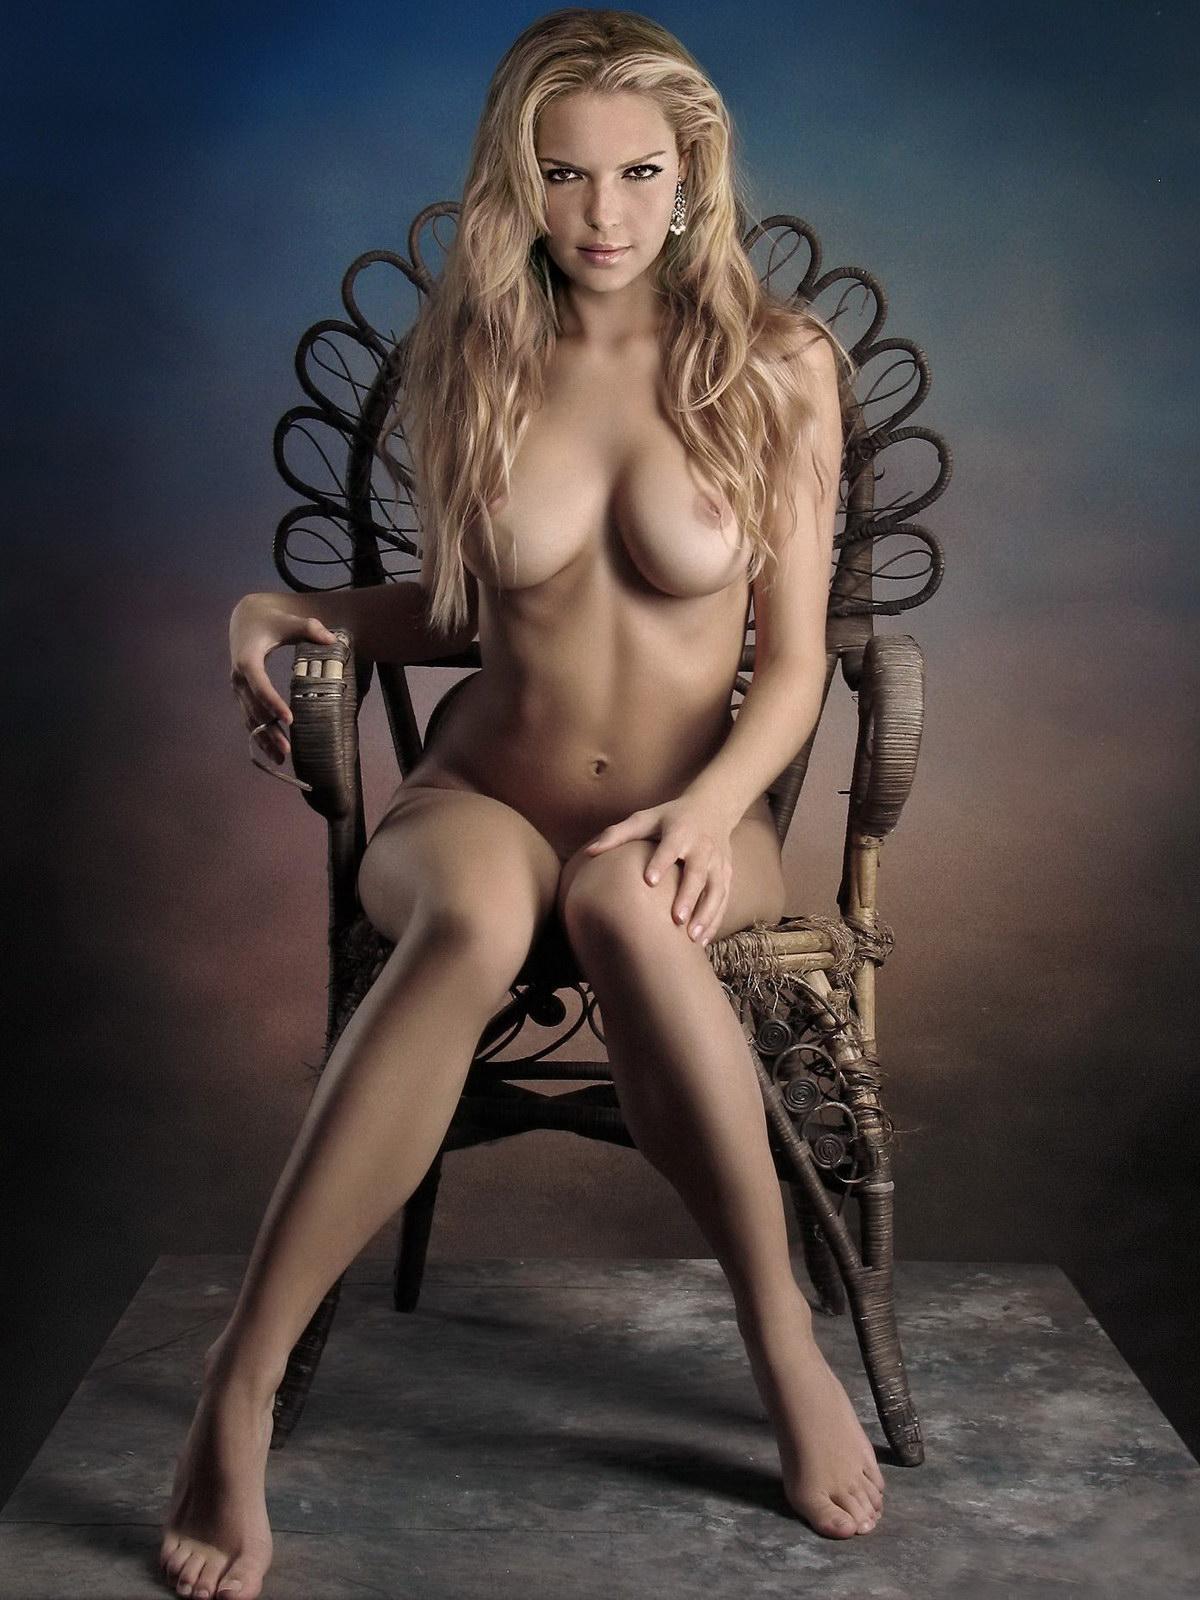 katherine heigl hot and naked